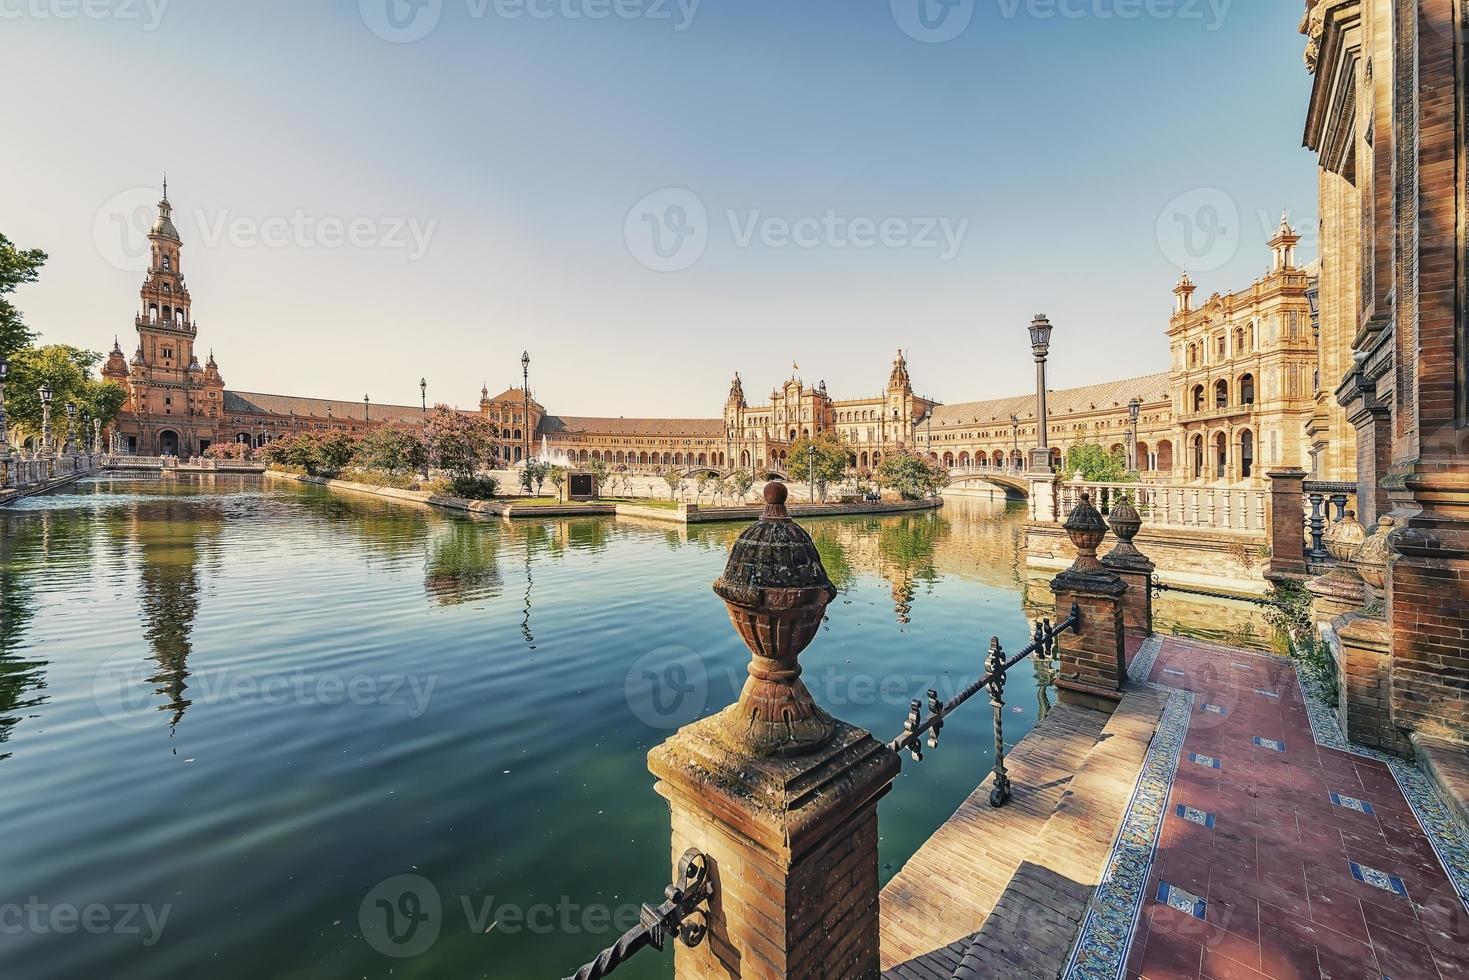 Plaza de Espana in Seville Andalusia Spain photo